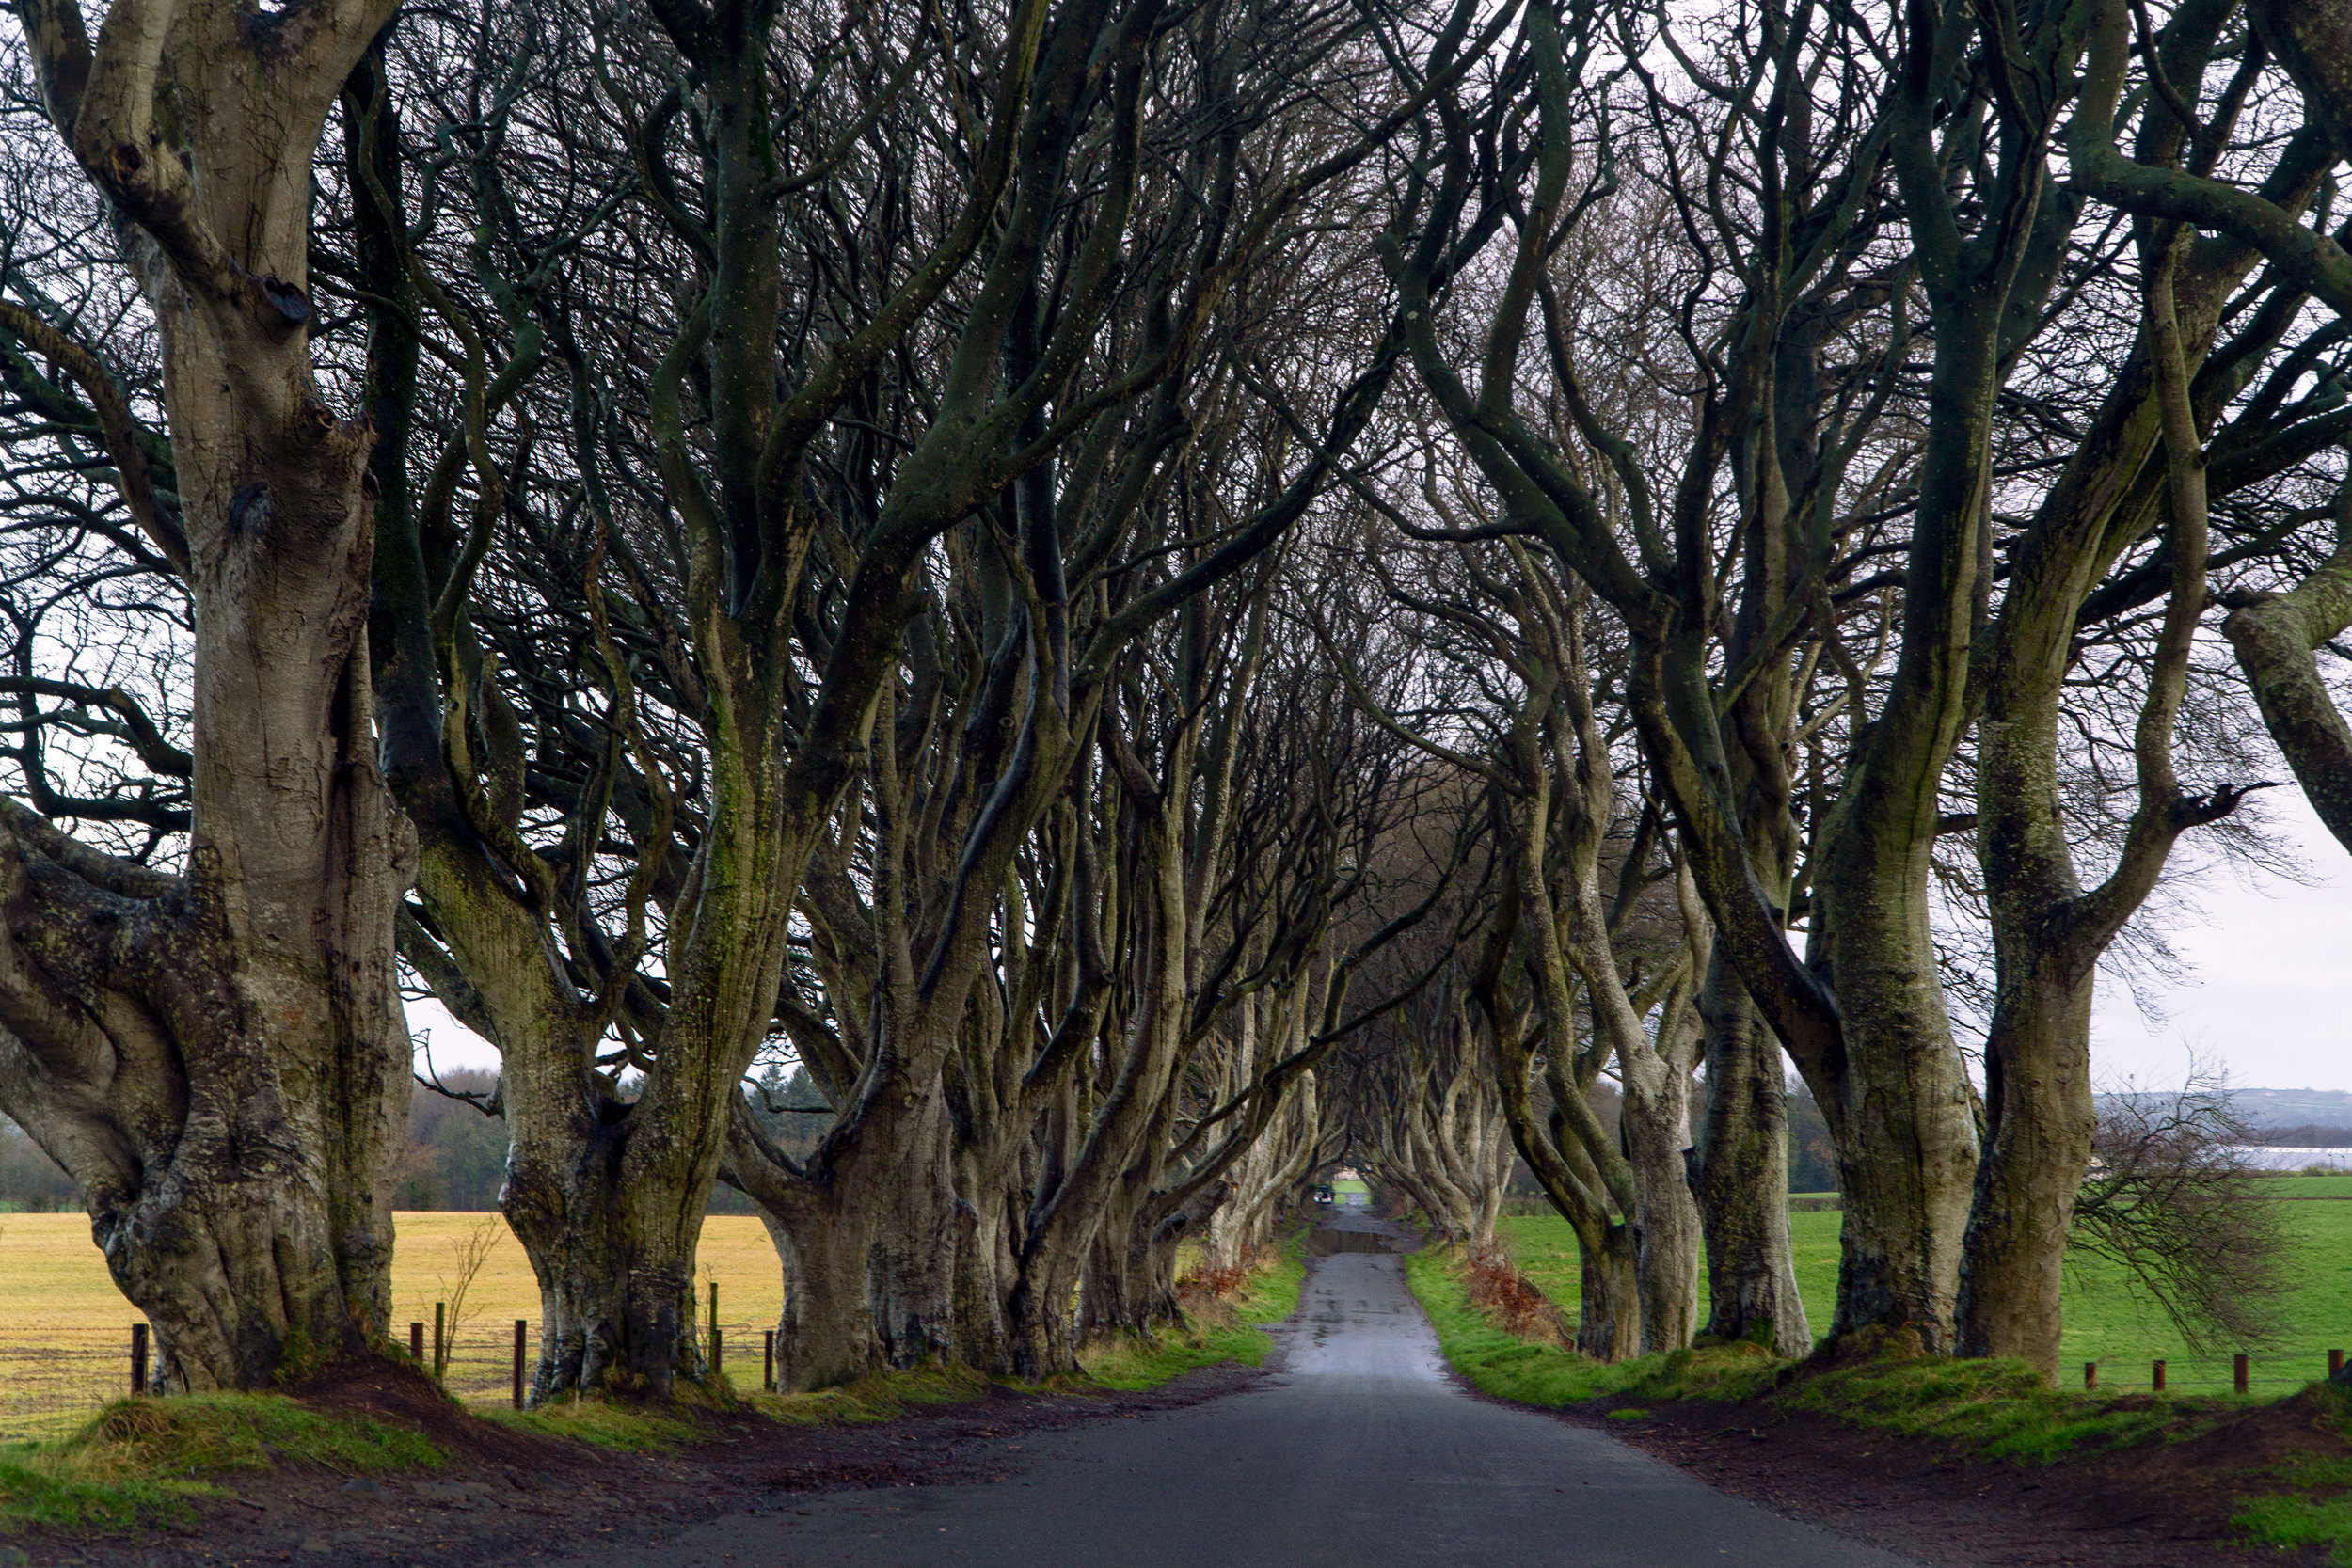 northern_Ireland_the_dark_hedges_vickugood_travel_photography_sm.jpg